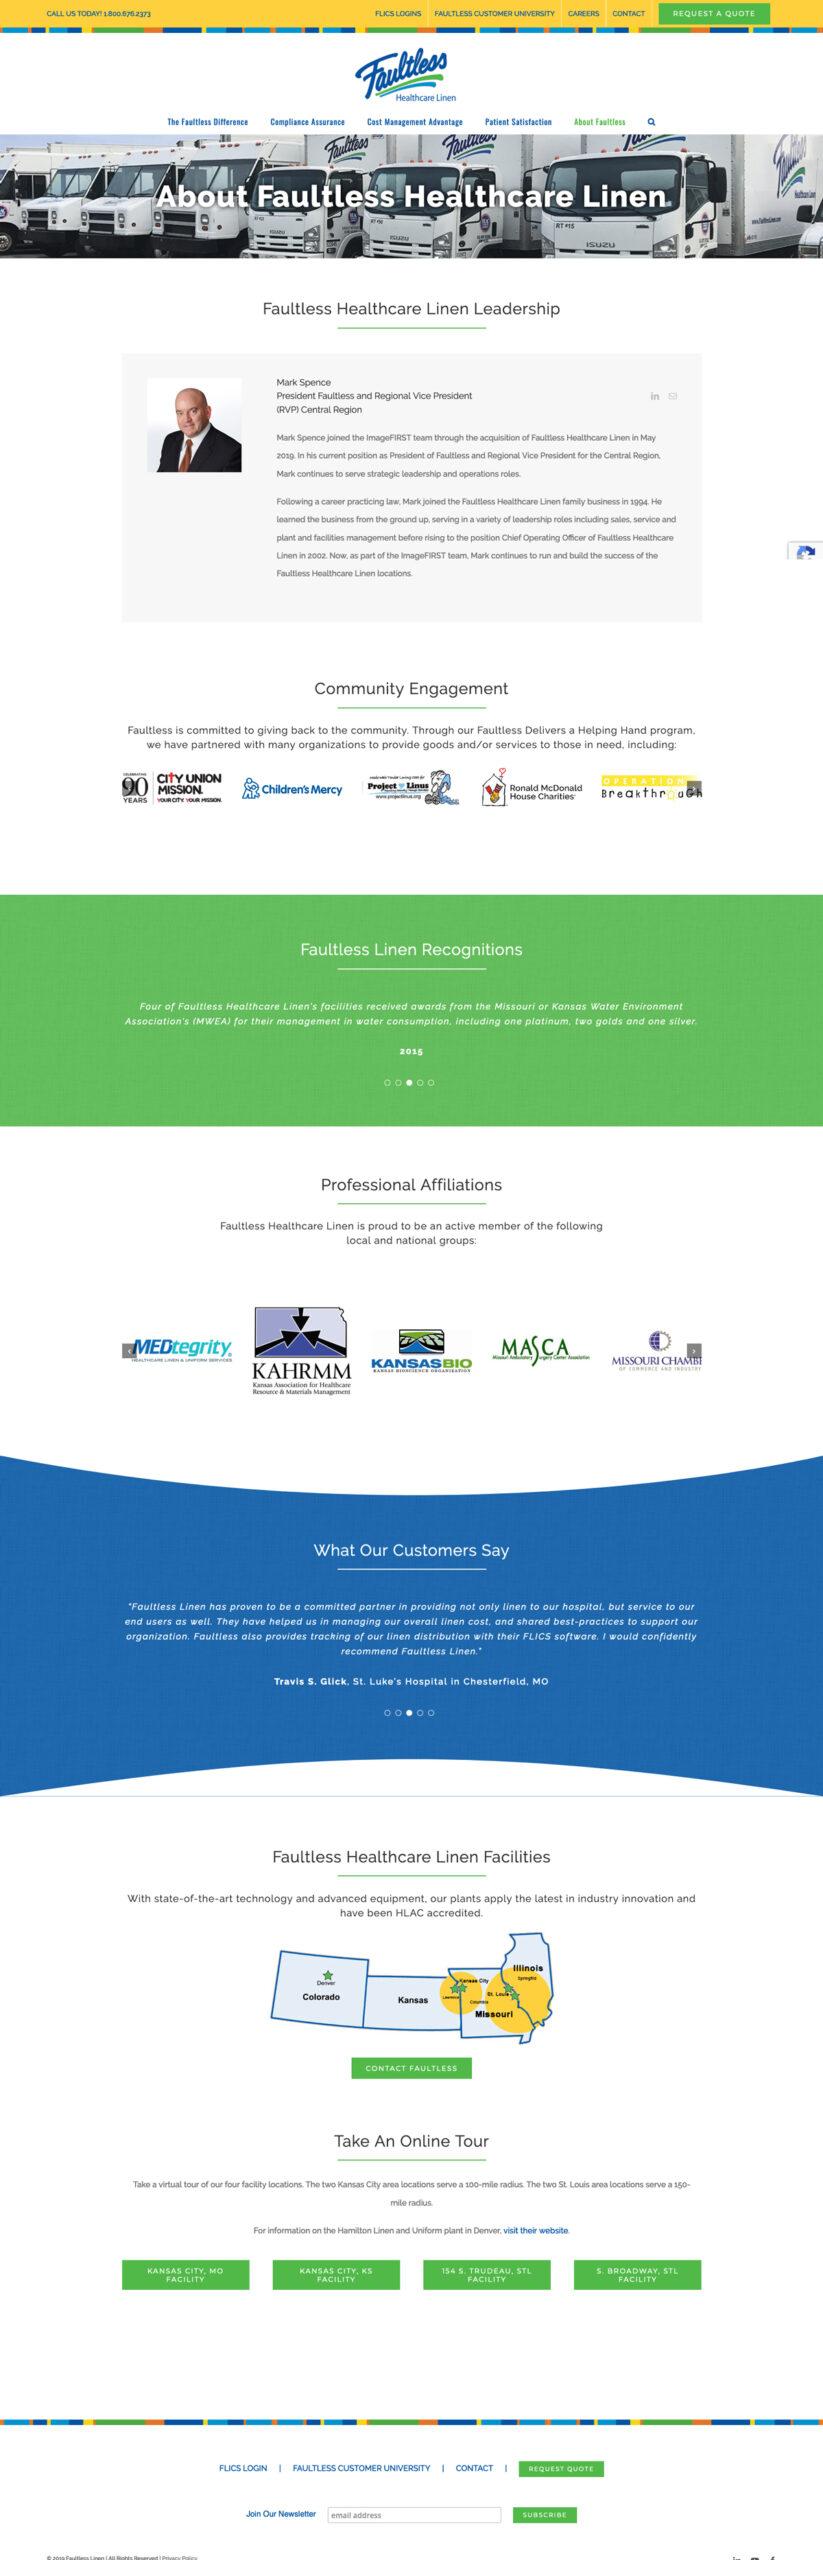 Company Website Design for Faultless Healthcare Linen - About Faultless Healtcare Linen